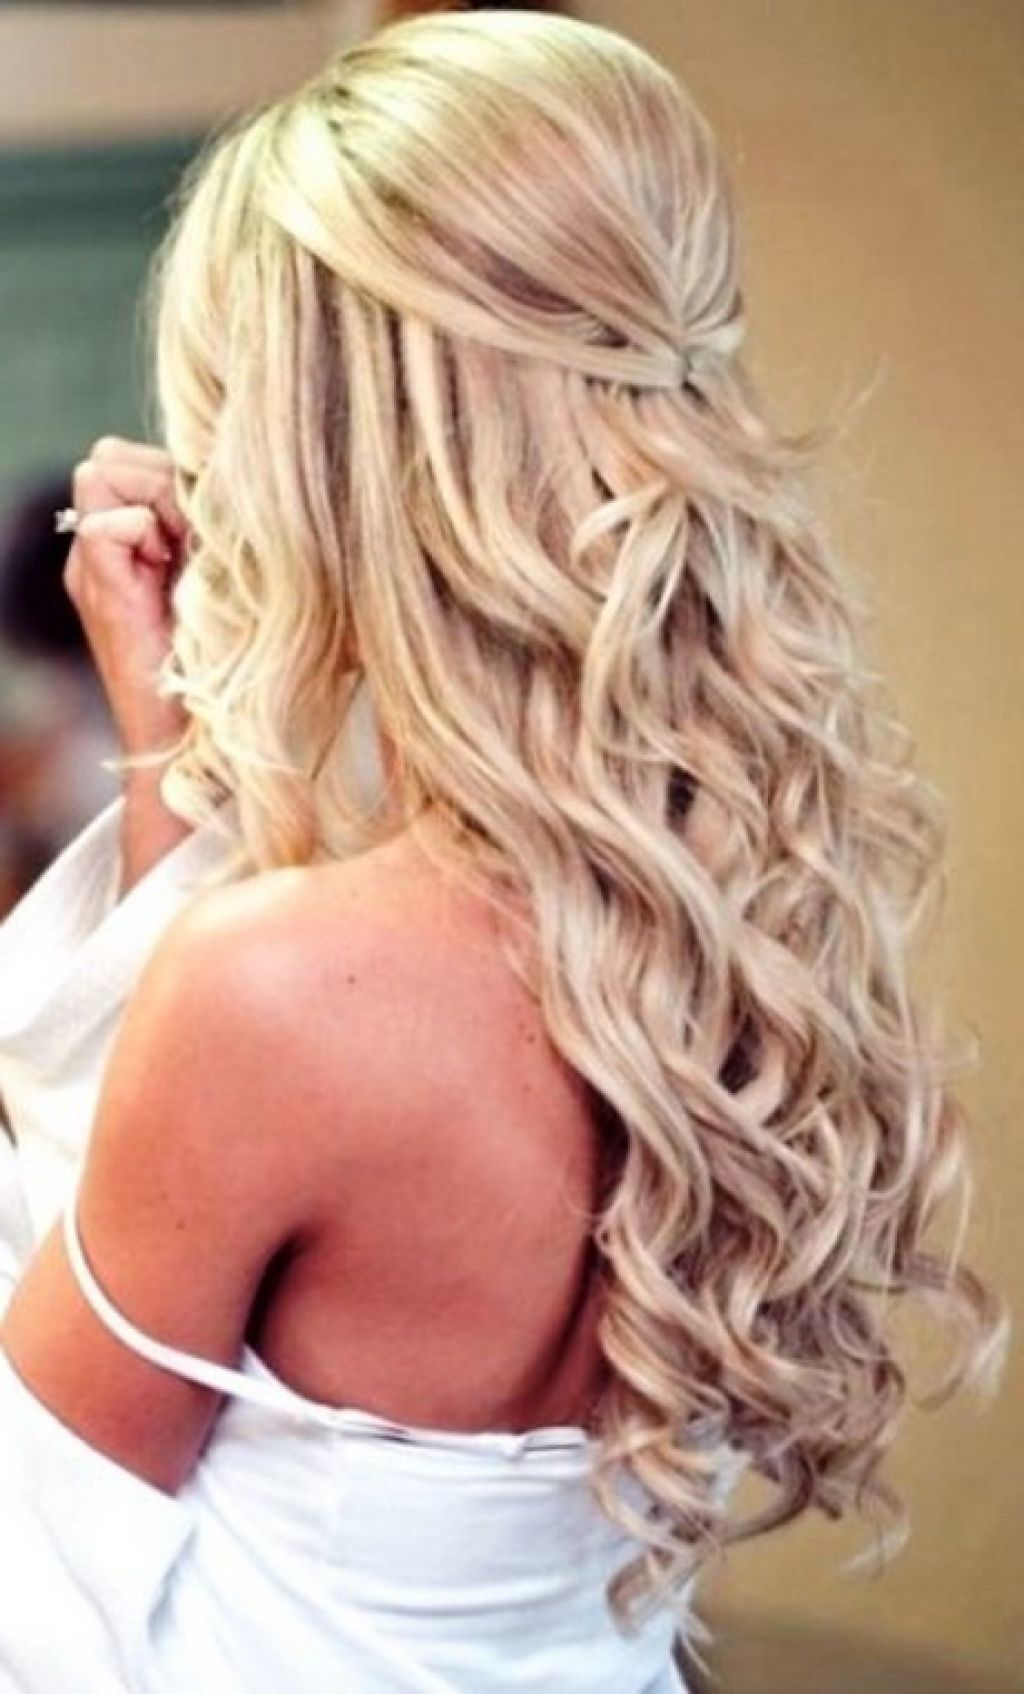 Frisuren Fur Abschlussball Fur Mittellanges Haar Abschlussball